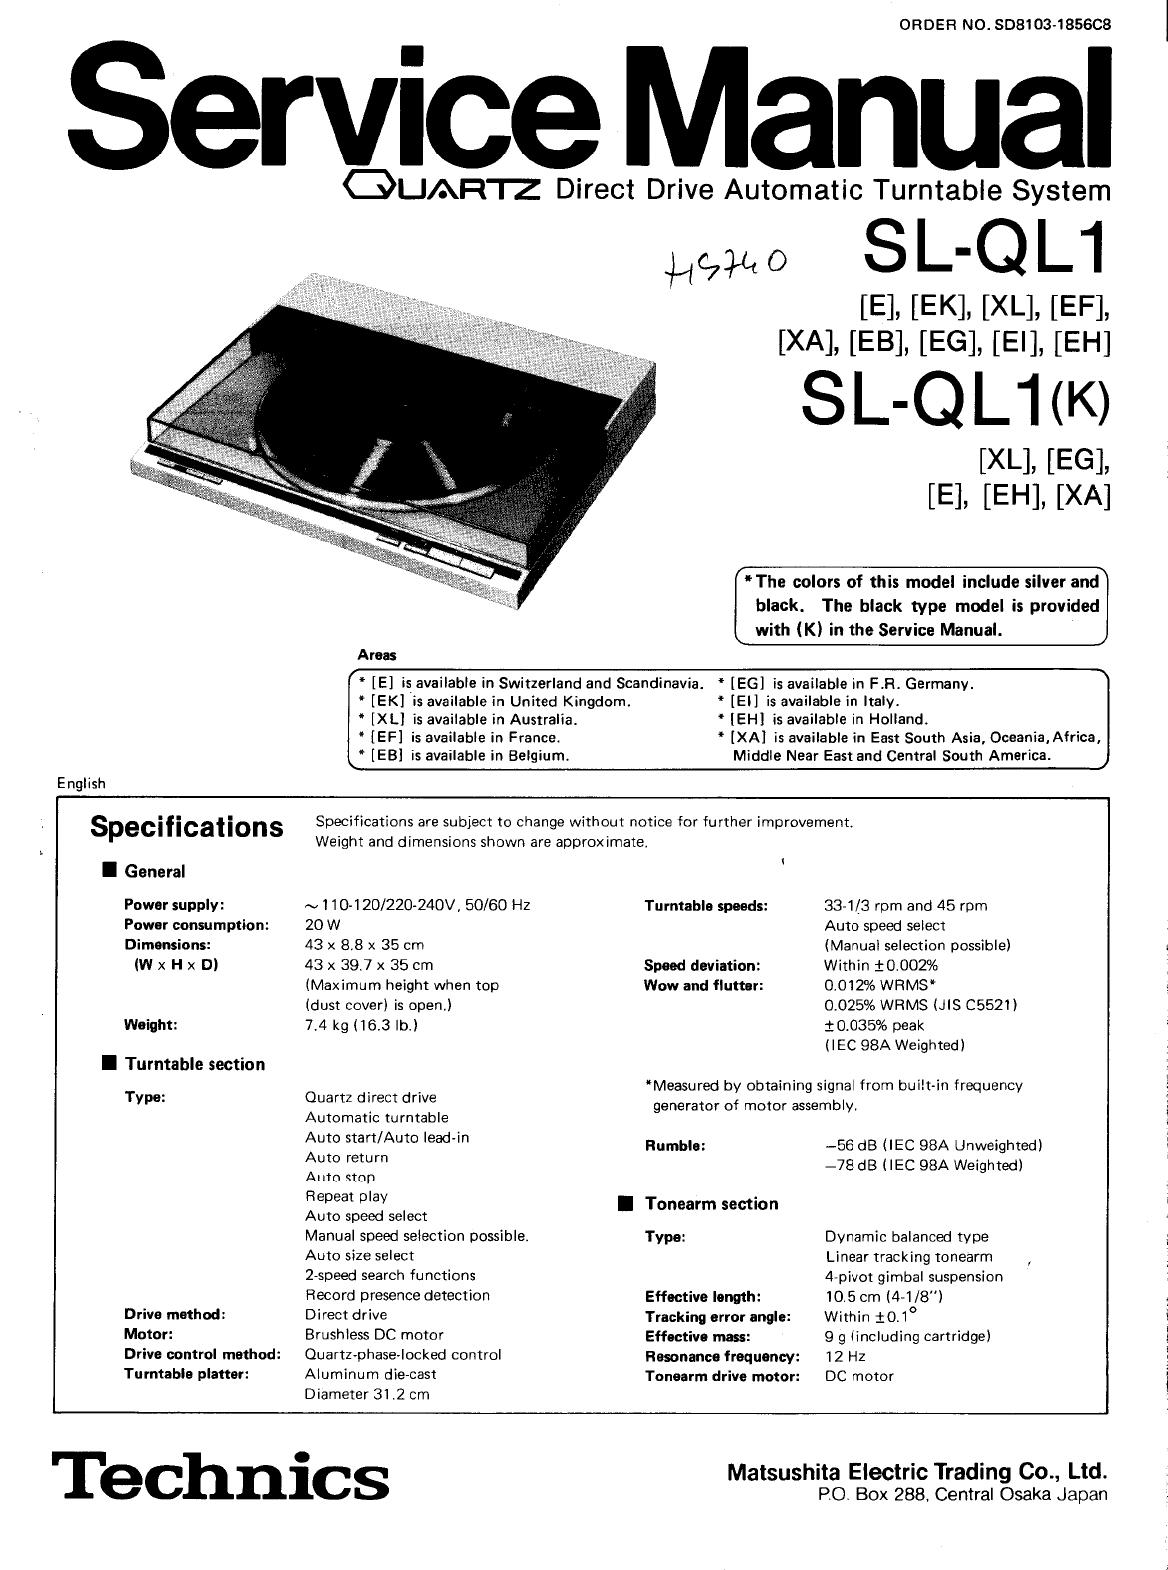 Technics SLQL 1 Service Manual